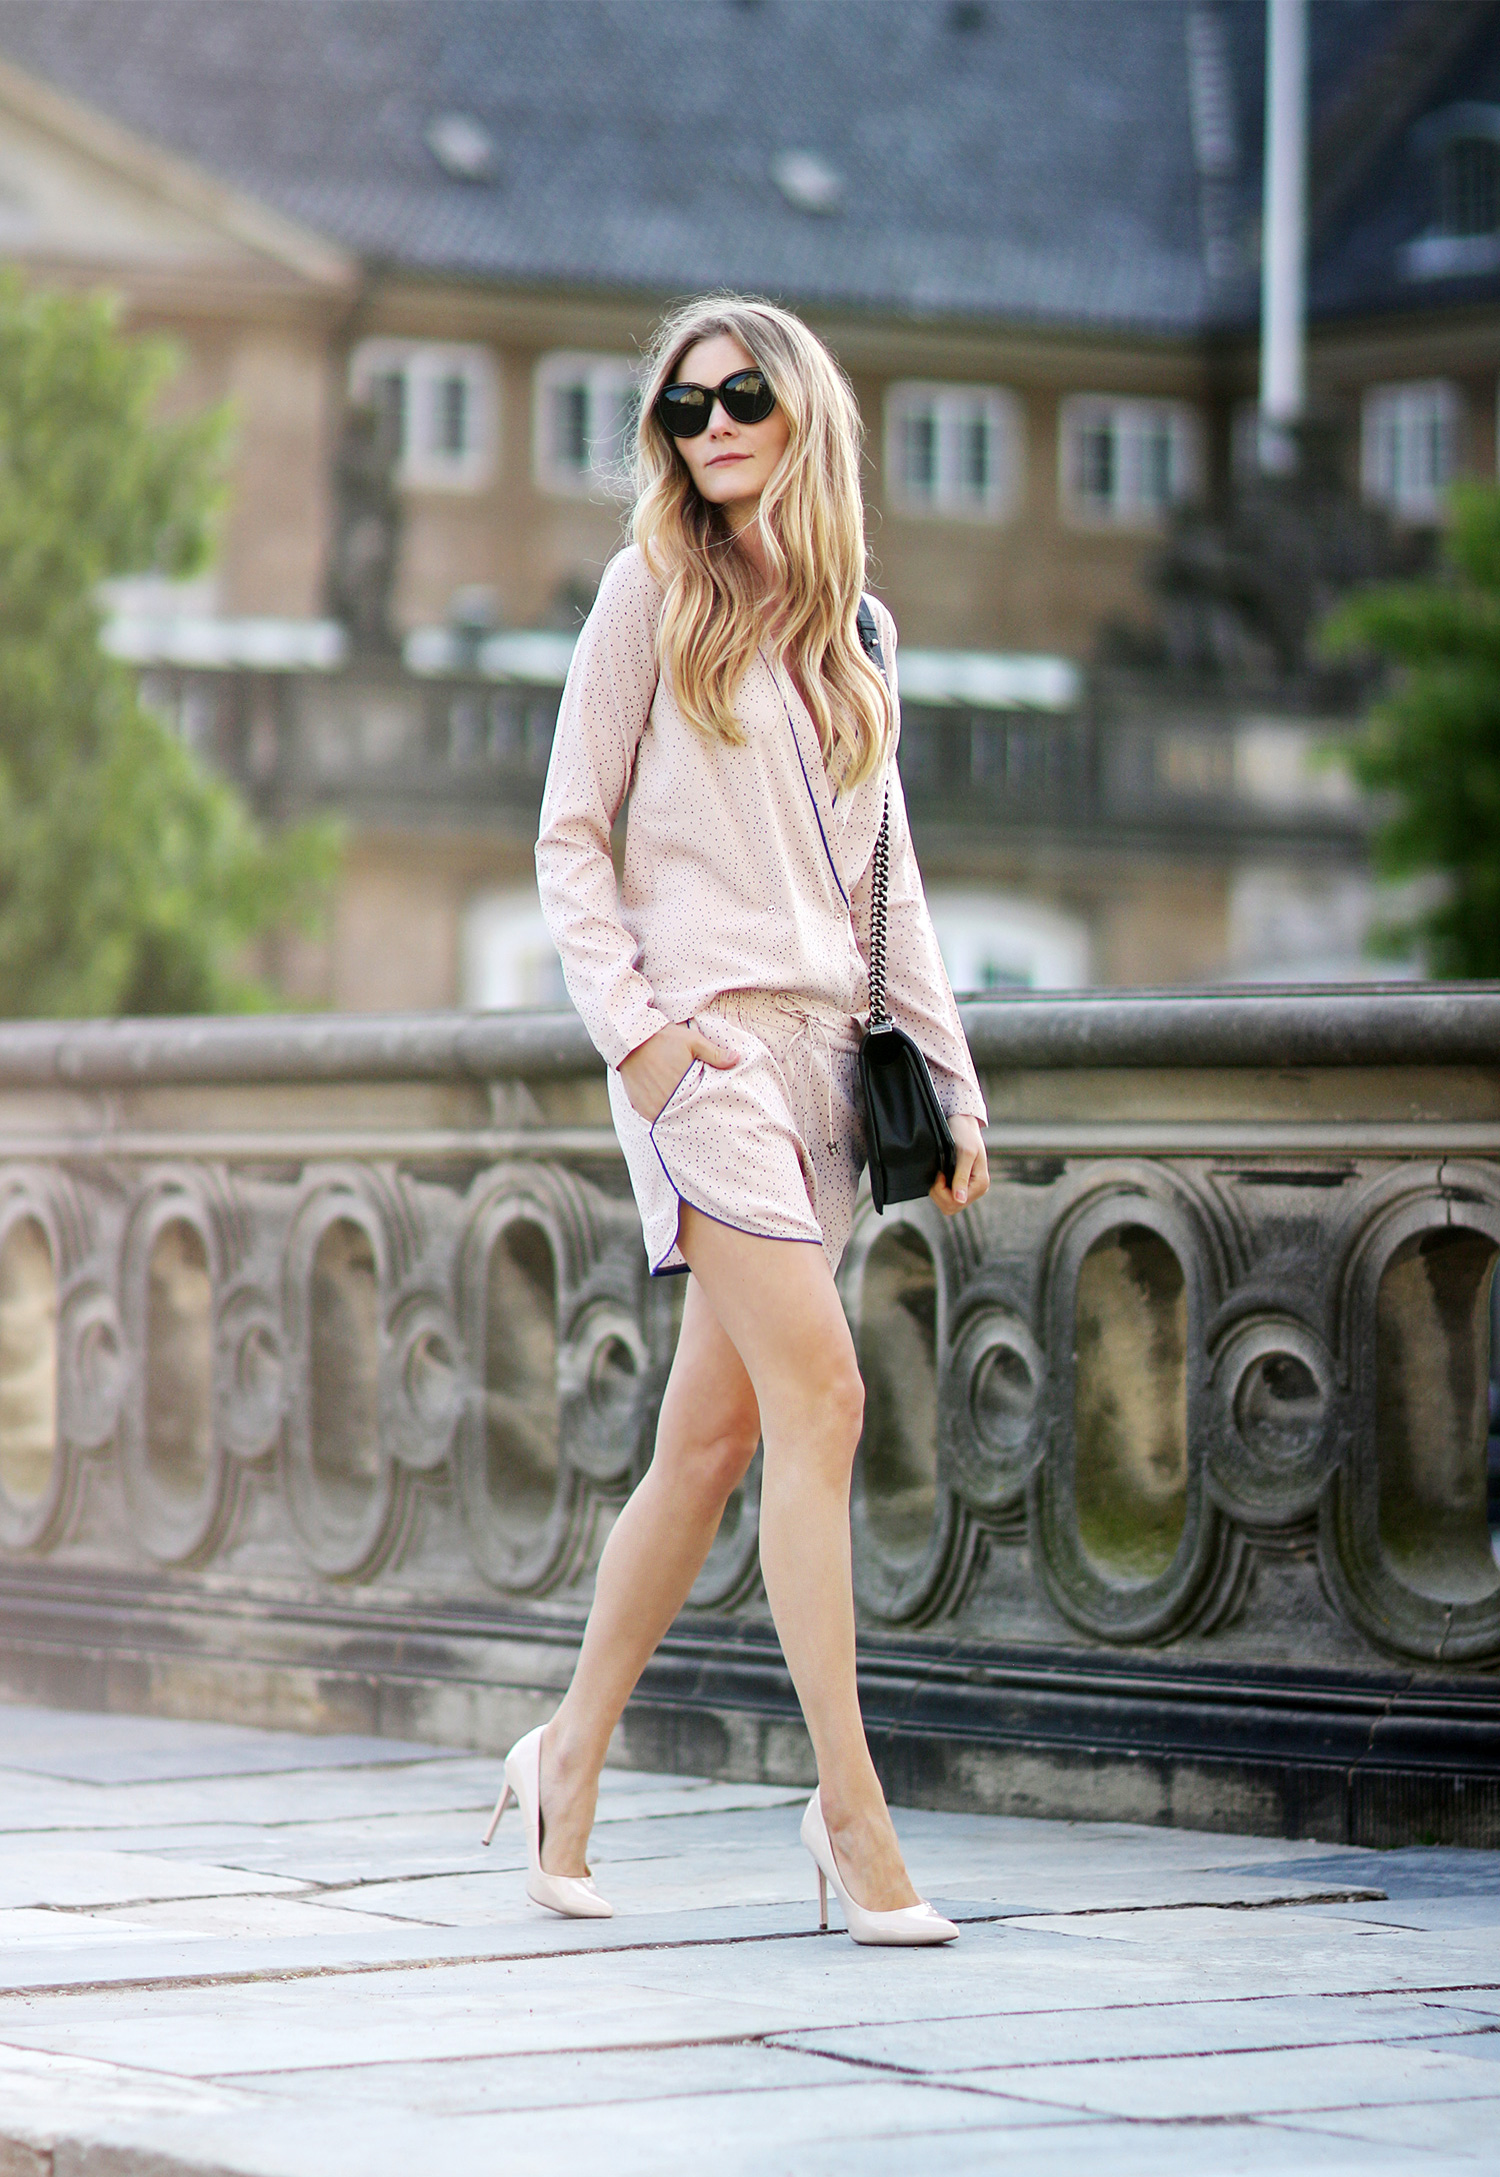 lyserødt-sæt-modeblog-âme-copenhagen-fashion-blog-tøj-shopping@2x1